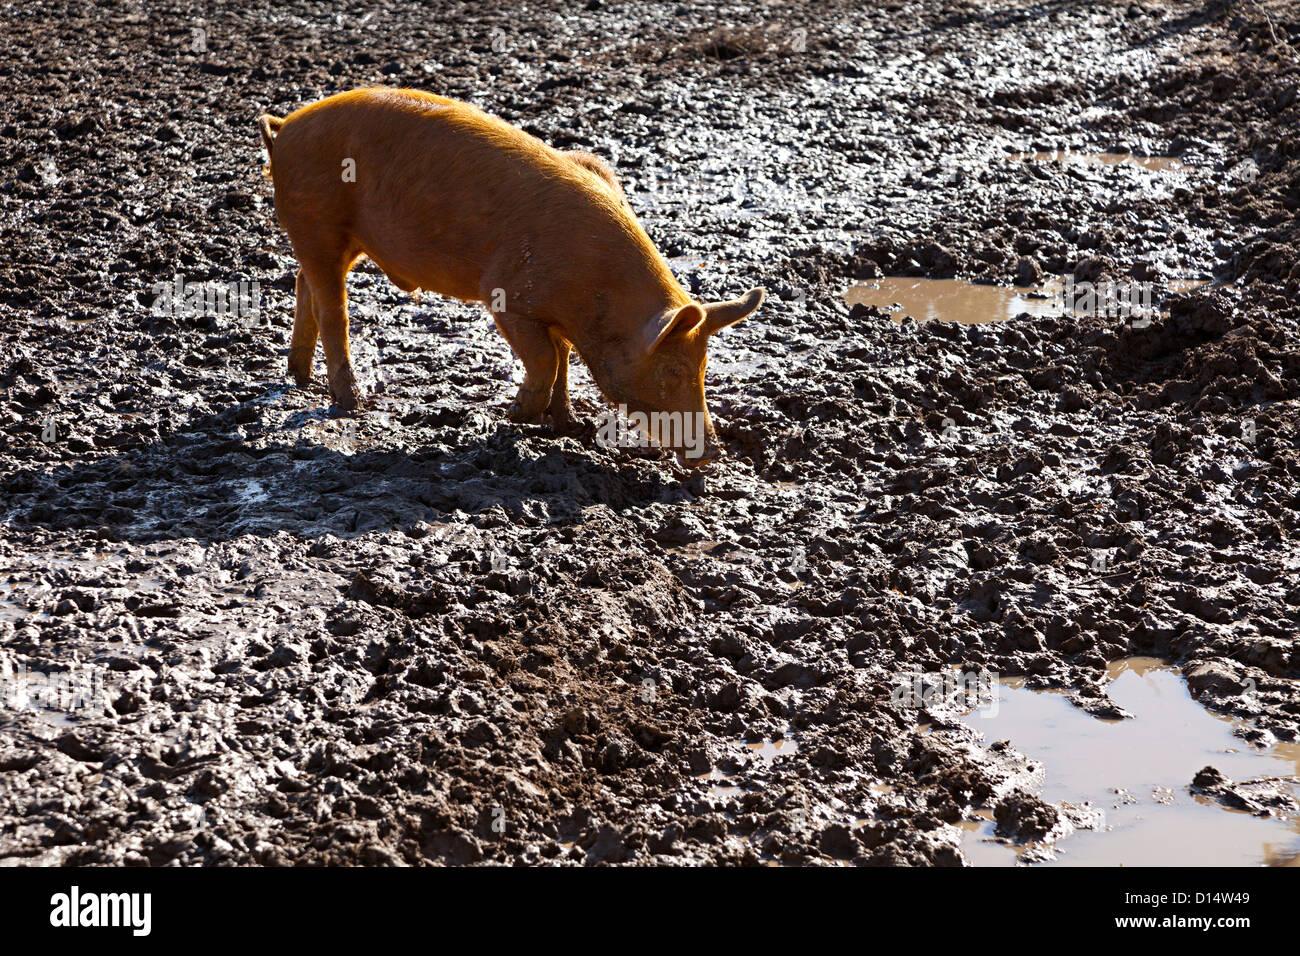 Maiale nel fango, UK Immagini Stock